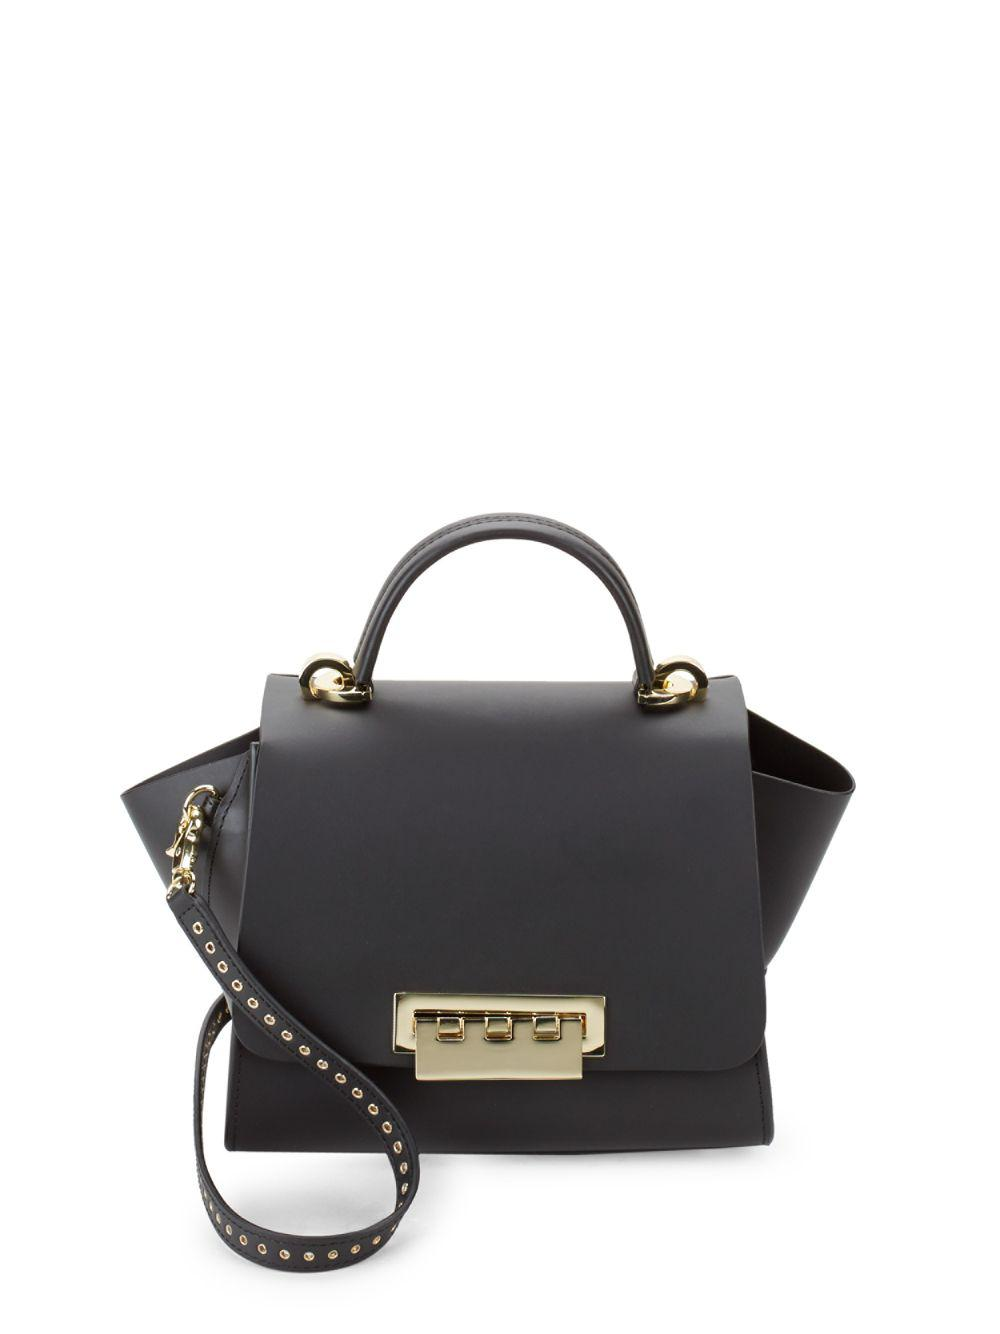 Lyst - Zac Zac Posen Eartha Flap Leather Top Handle Bag in Black f8715d986d7e2